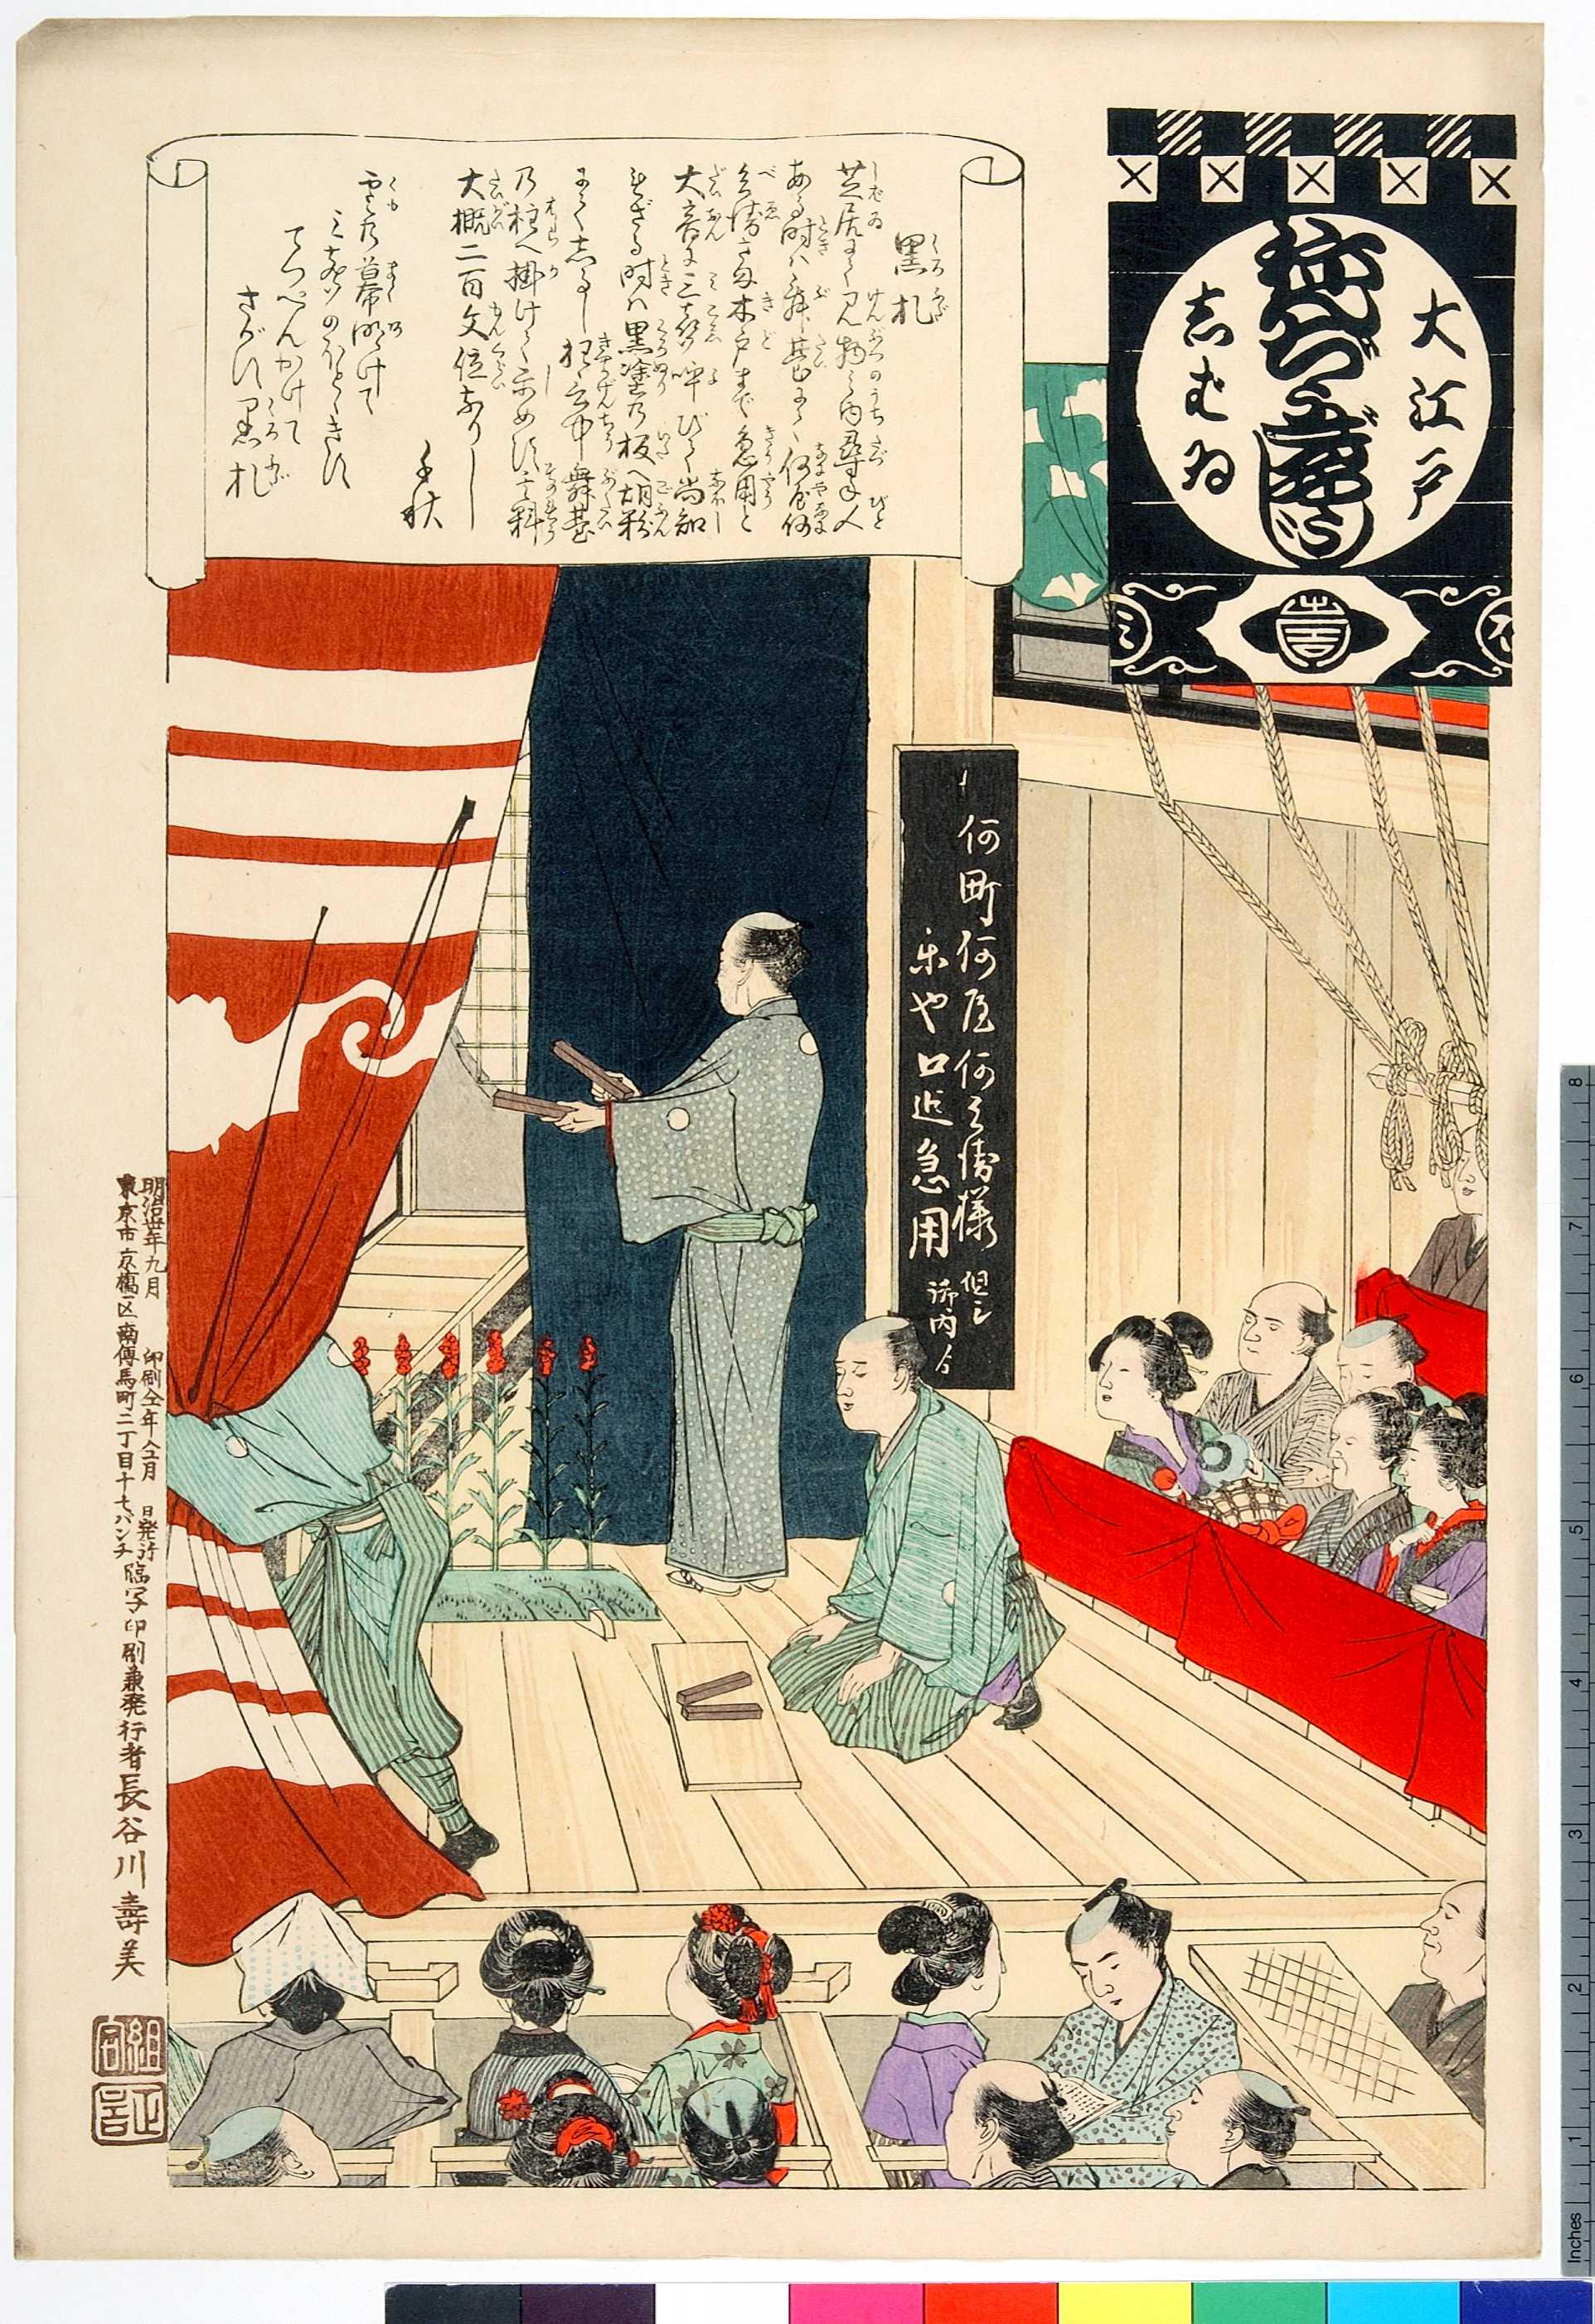 B05 Tsukeuchi, Hyoshigi, and Makuhiki